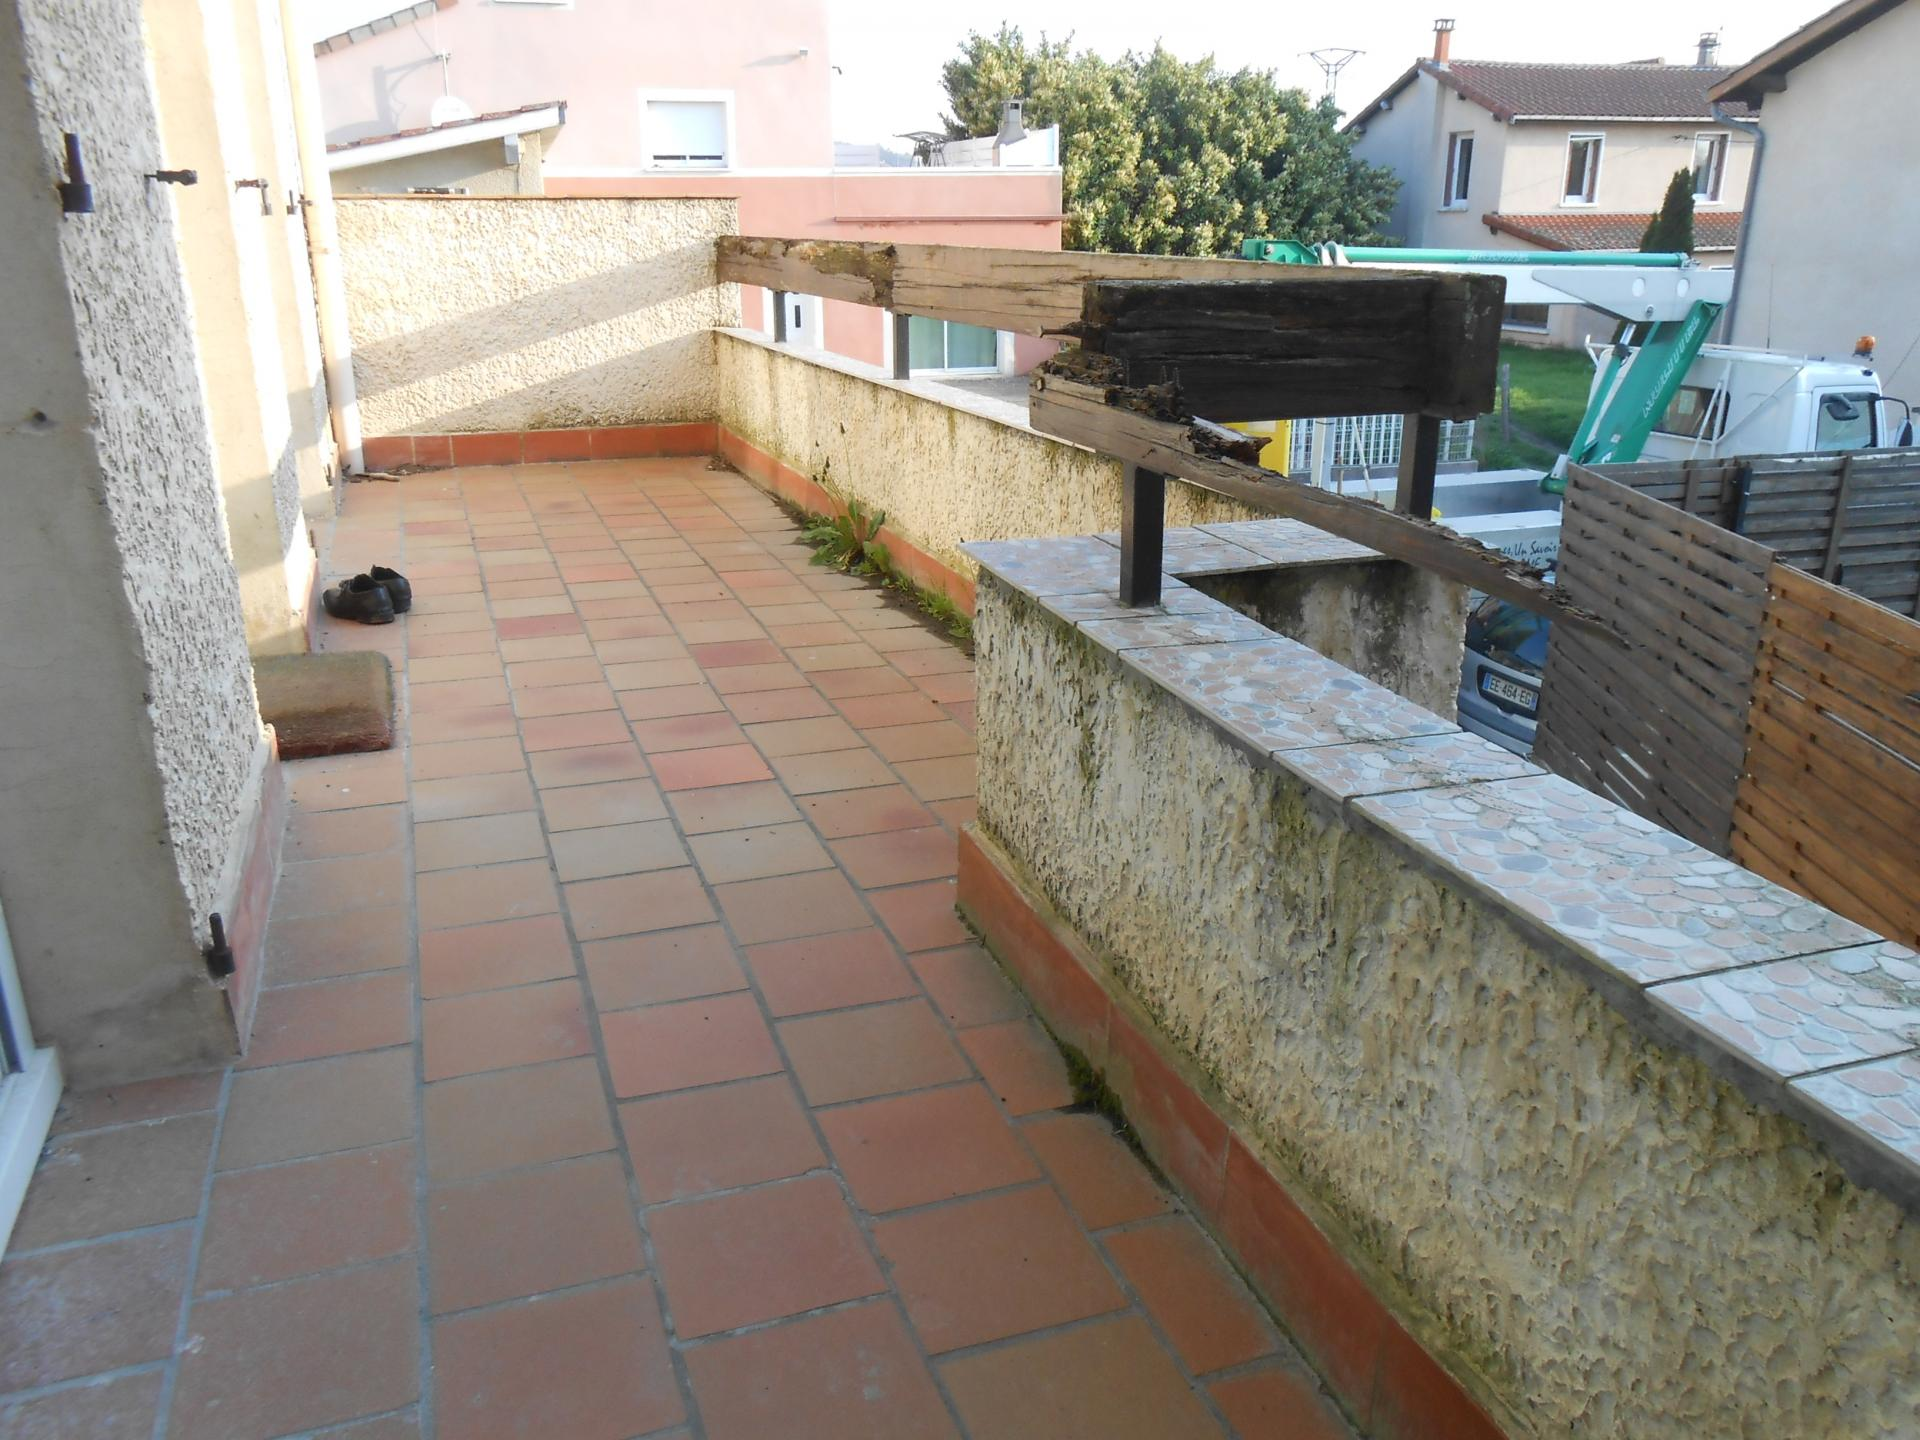 Terrasse sur lev e for Terrasse bois surelevee